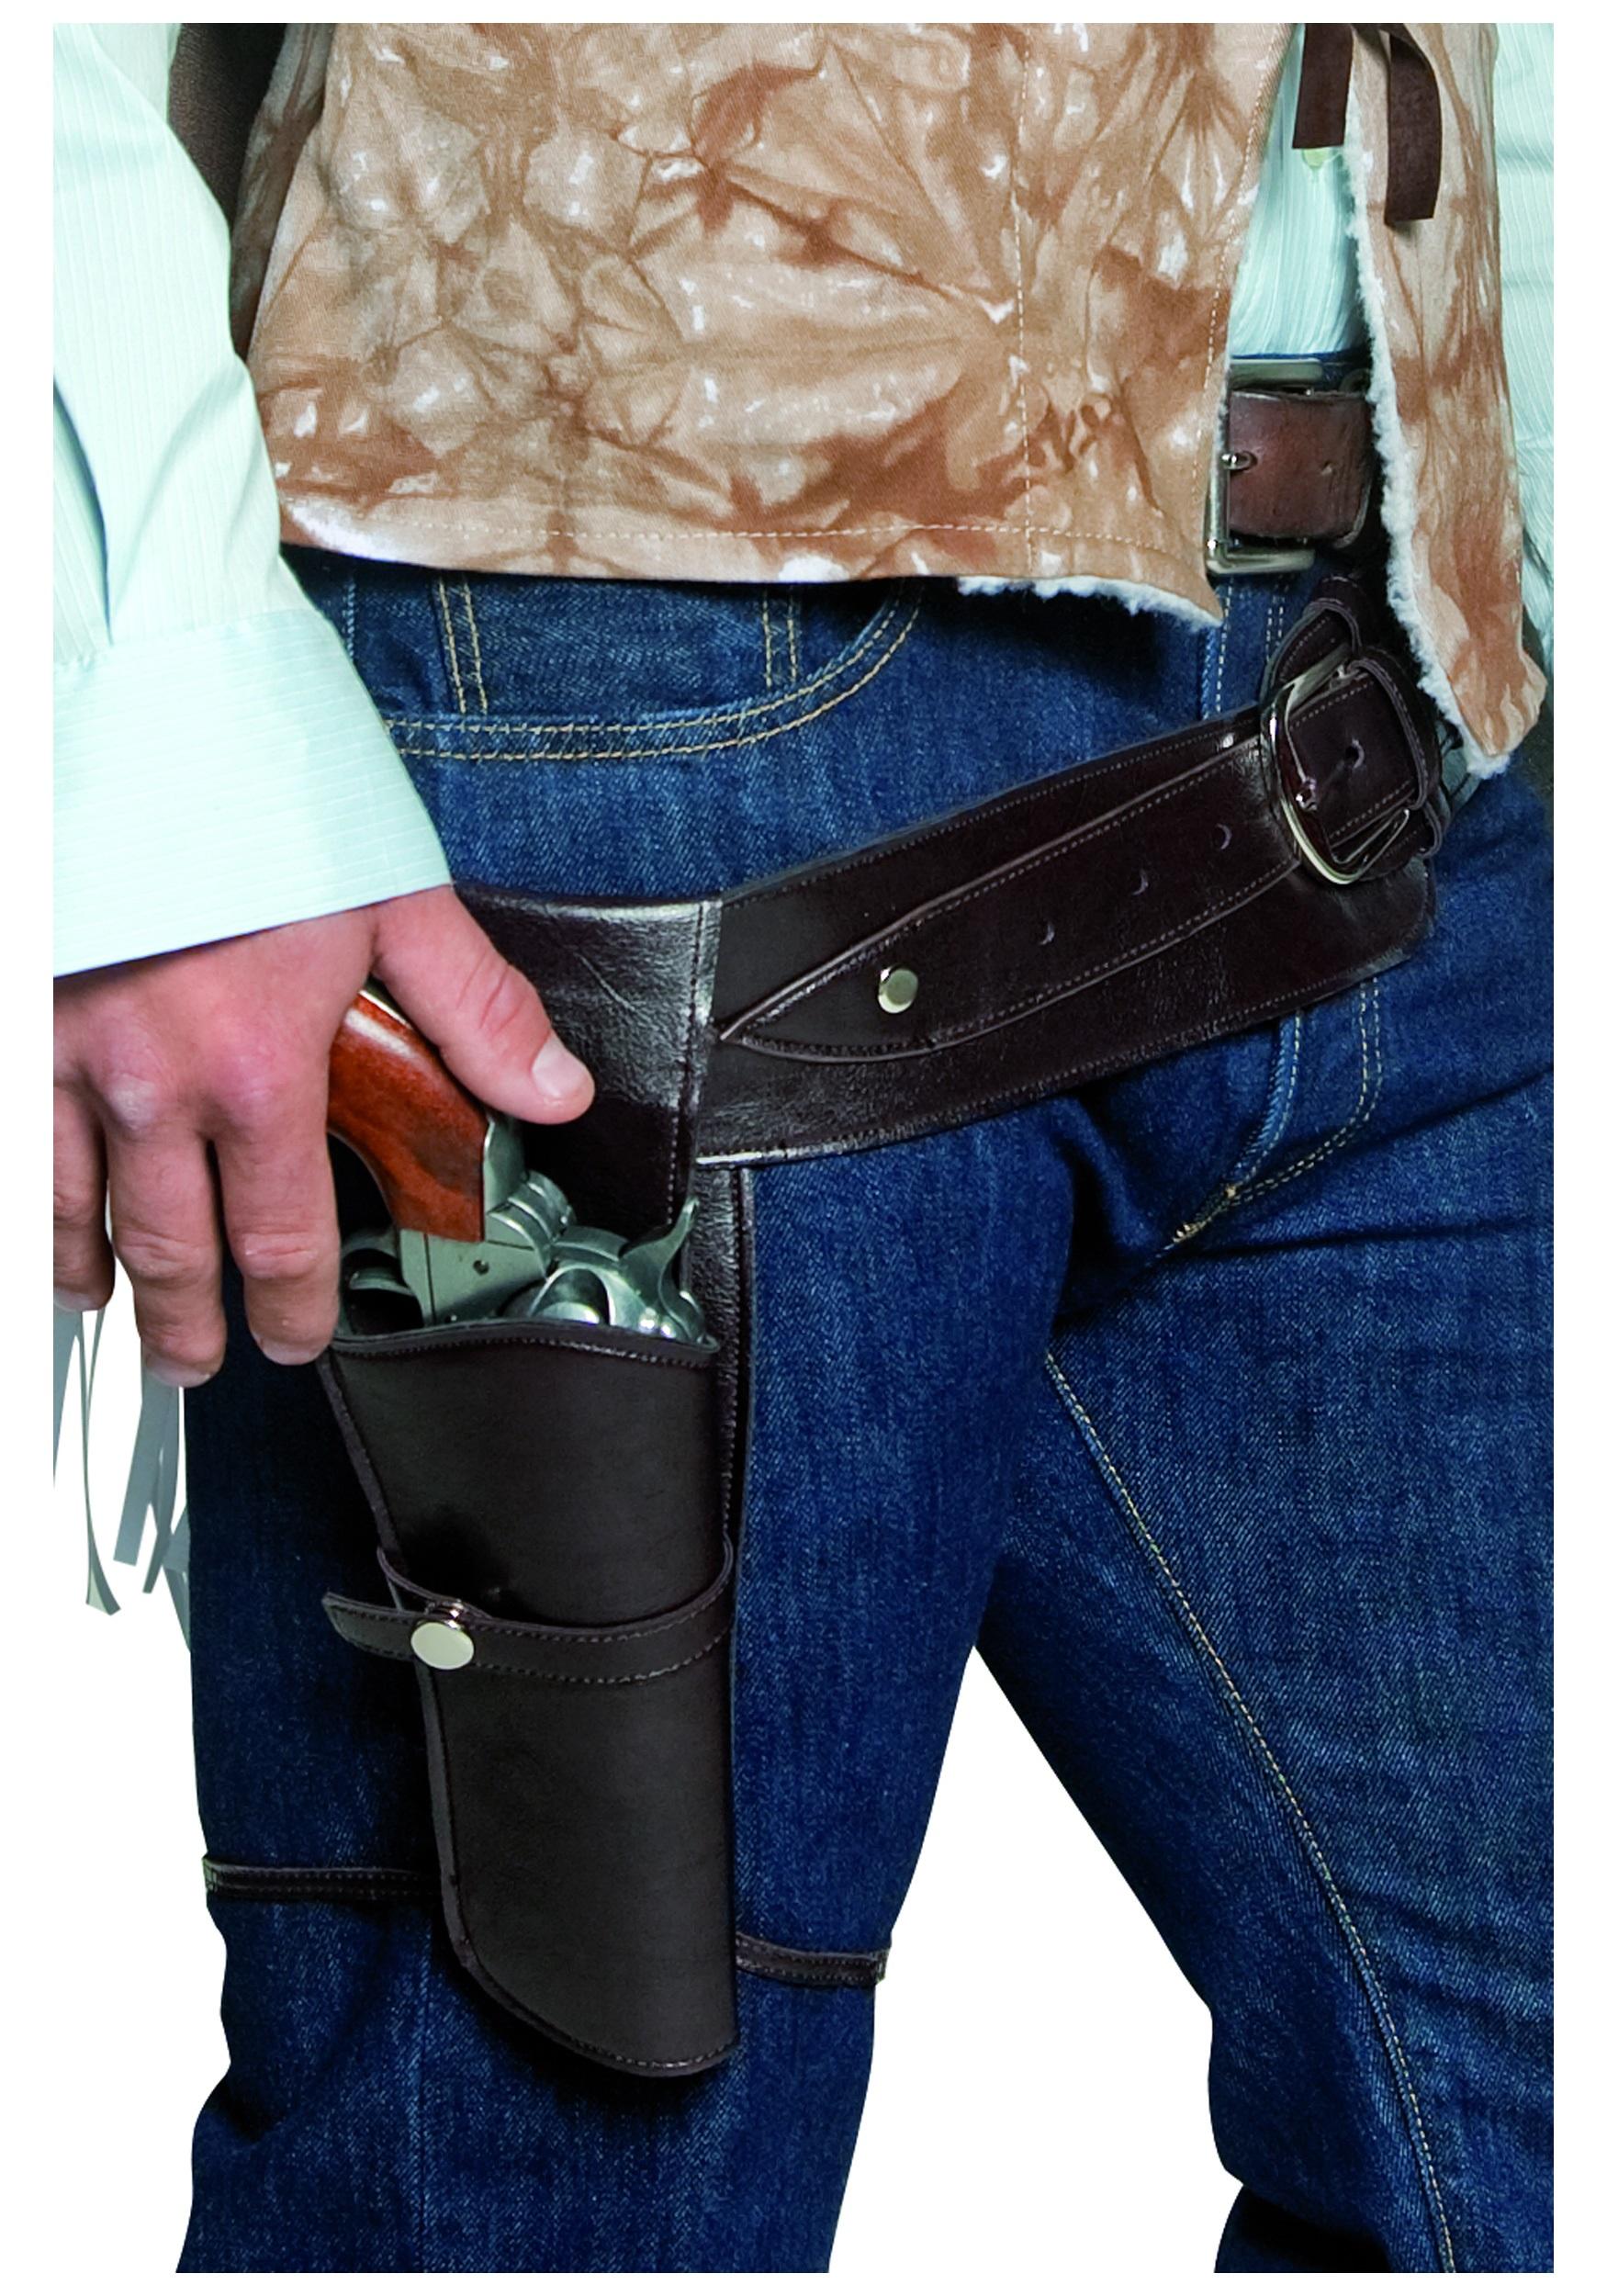 Western Gunman Revolver Holster and Belt